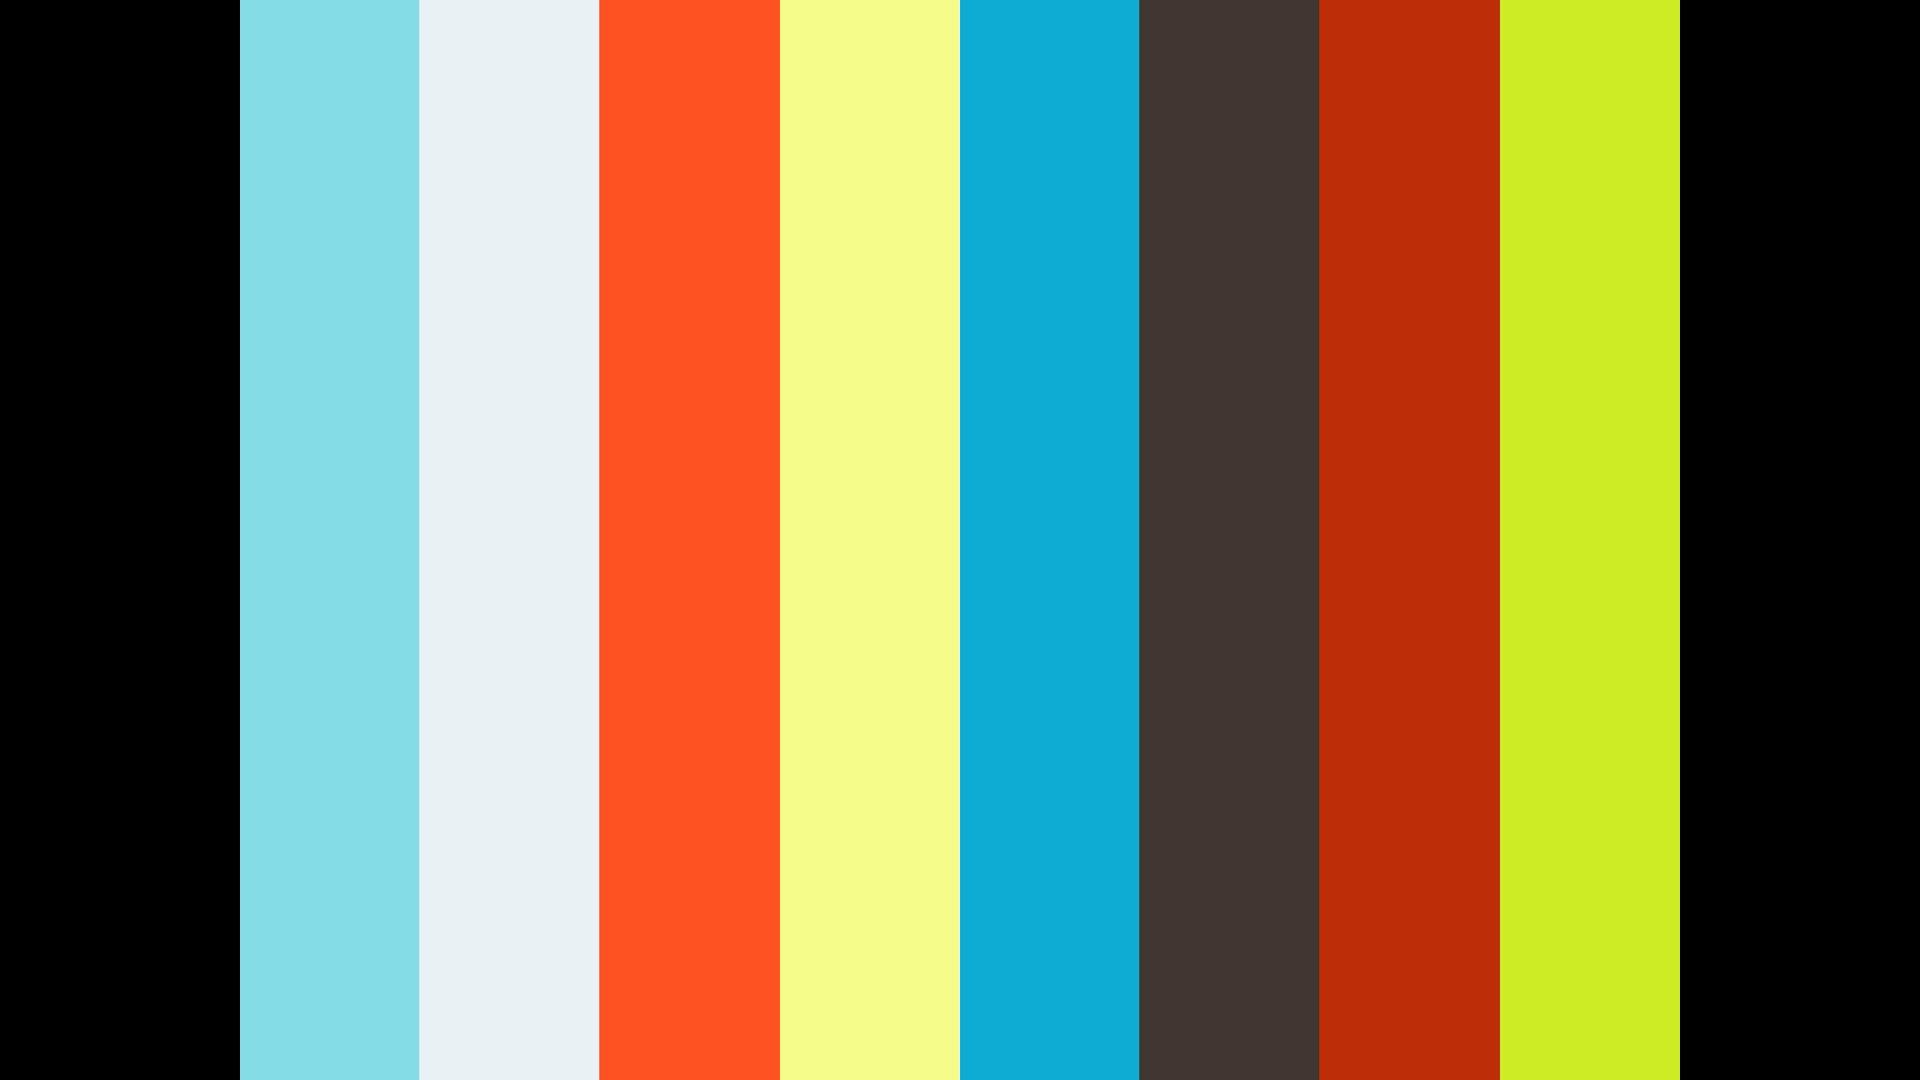 Dooinit Festival 2017 #6 - Thelonious Martin & Ymsey